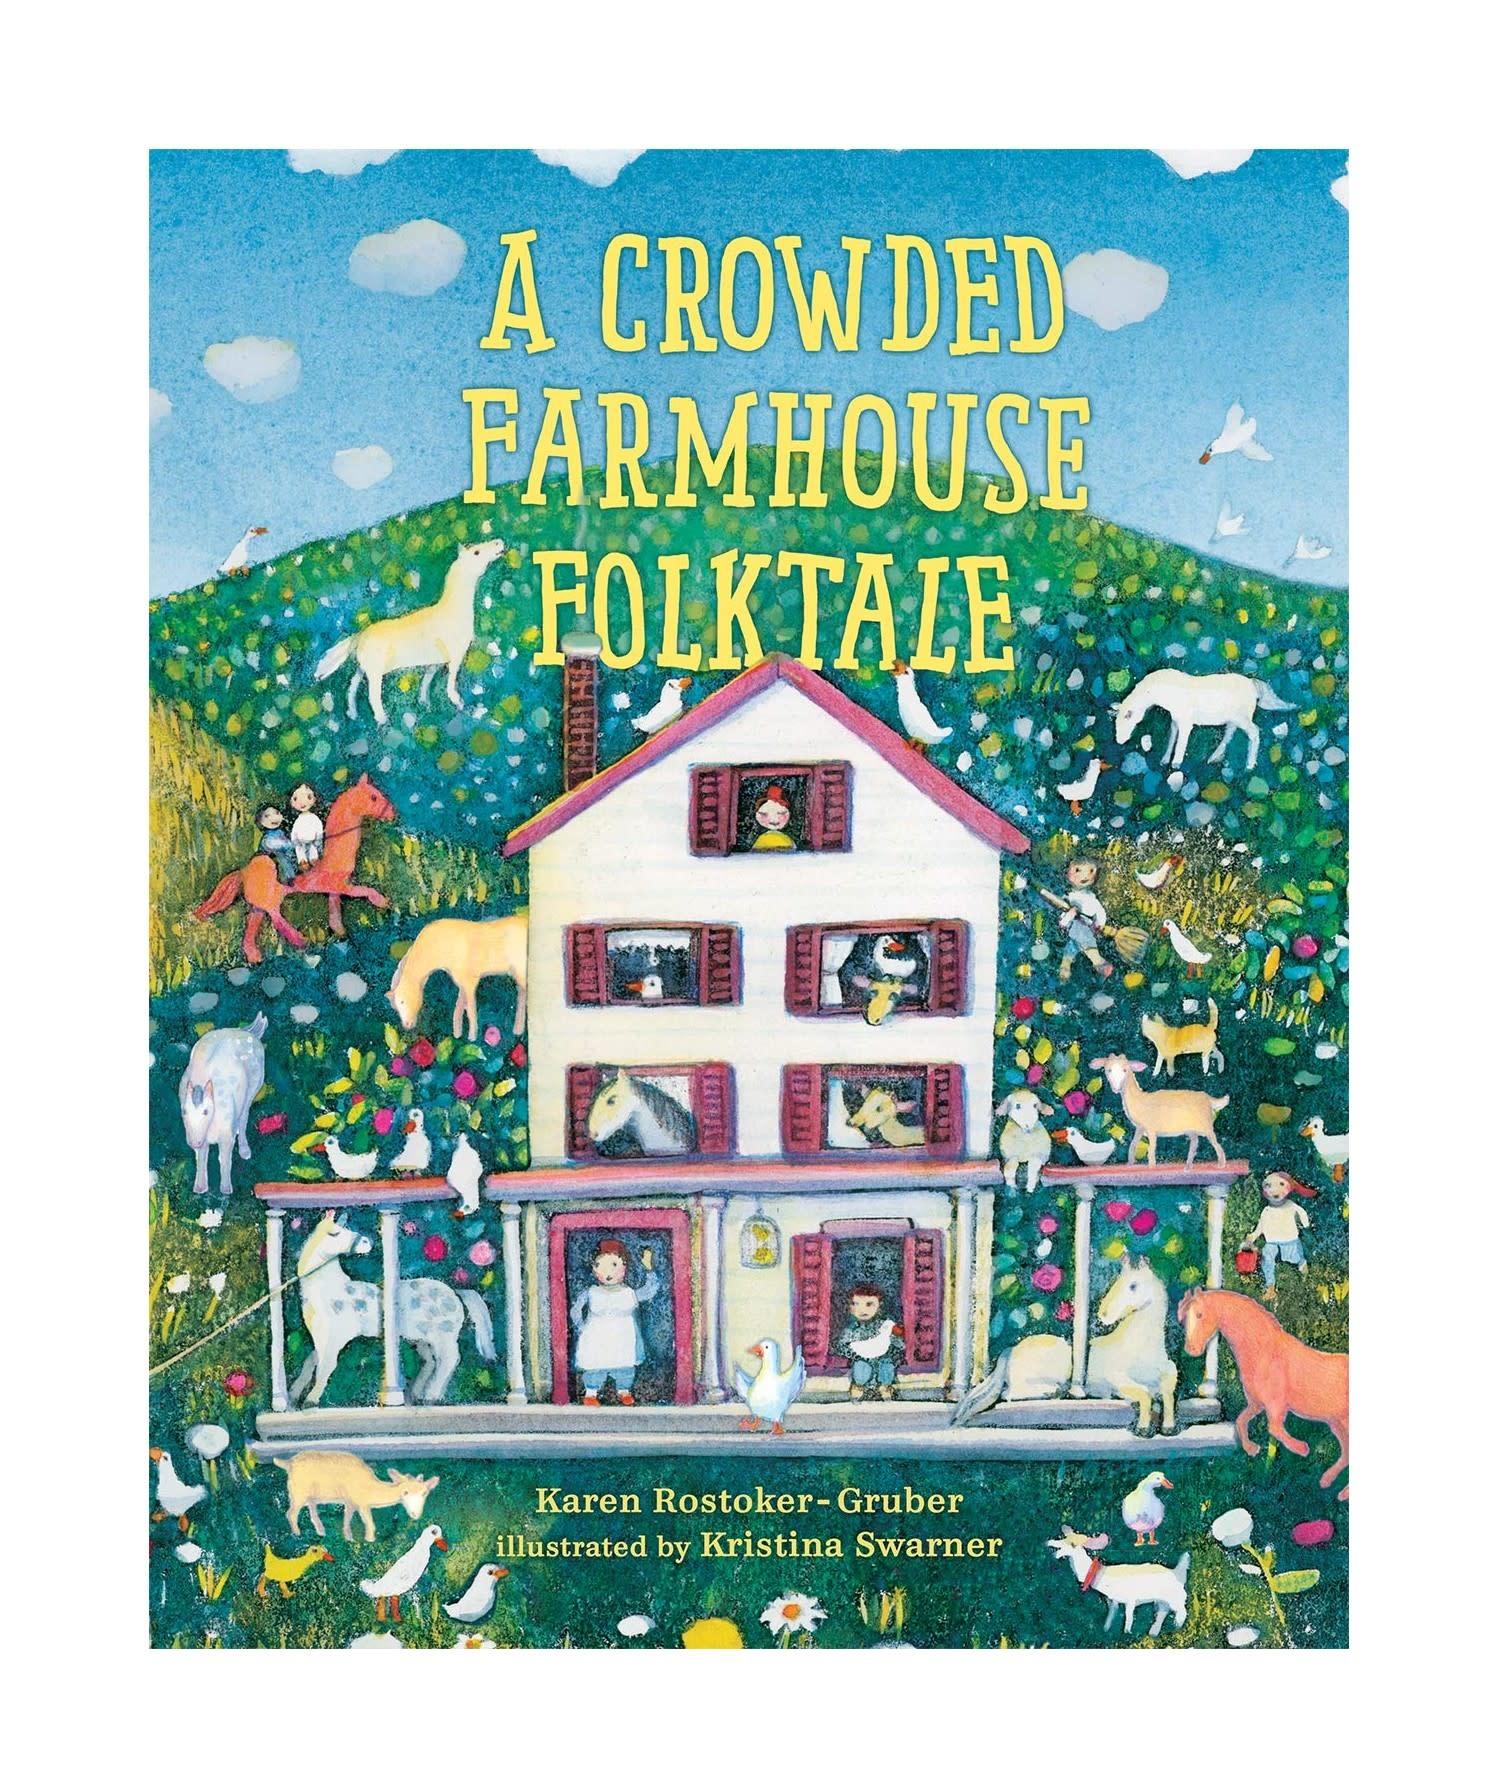 Albert Whitman & Company Book/ A Crowded Farmhouse Folktale